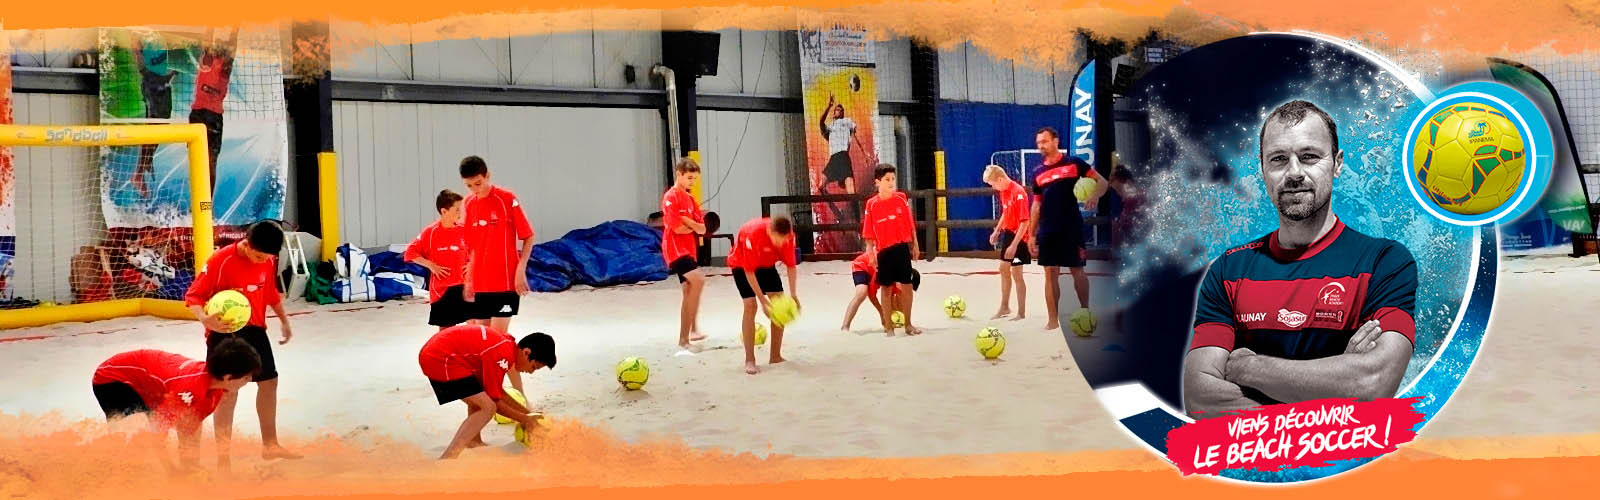 beach soccer rennes